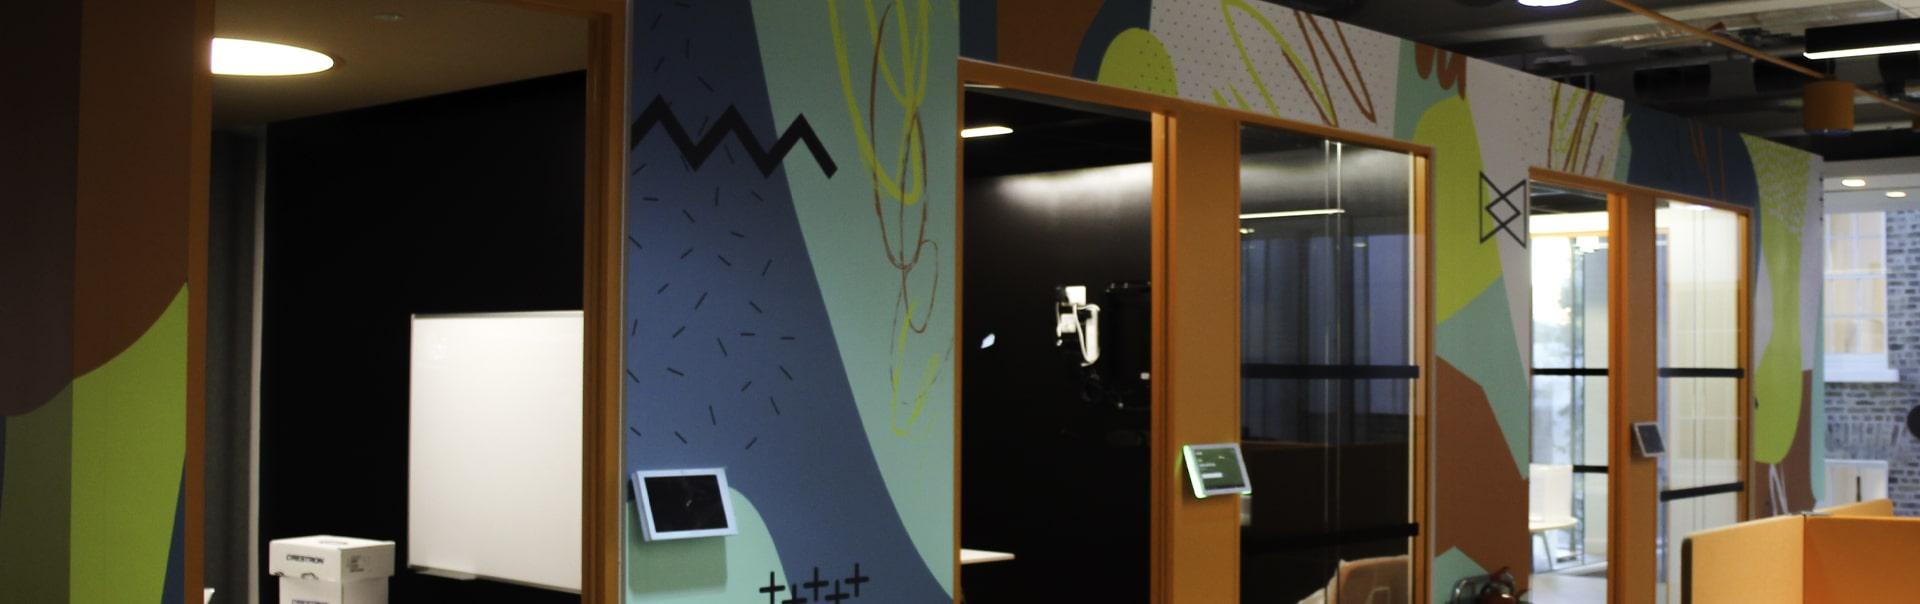 Hubspot Office | Wall Prints